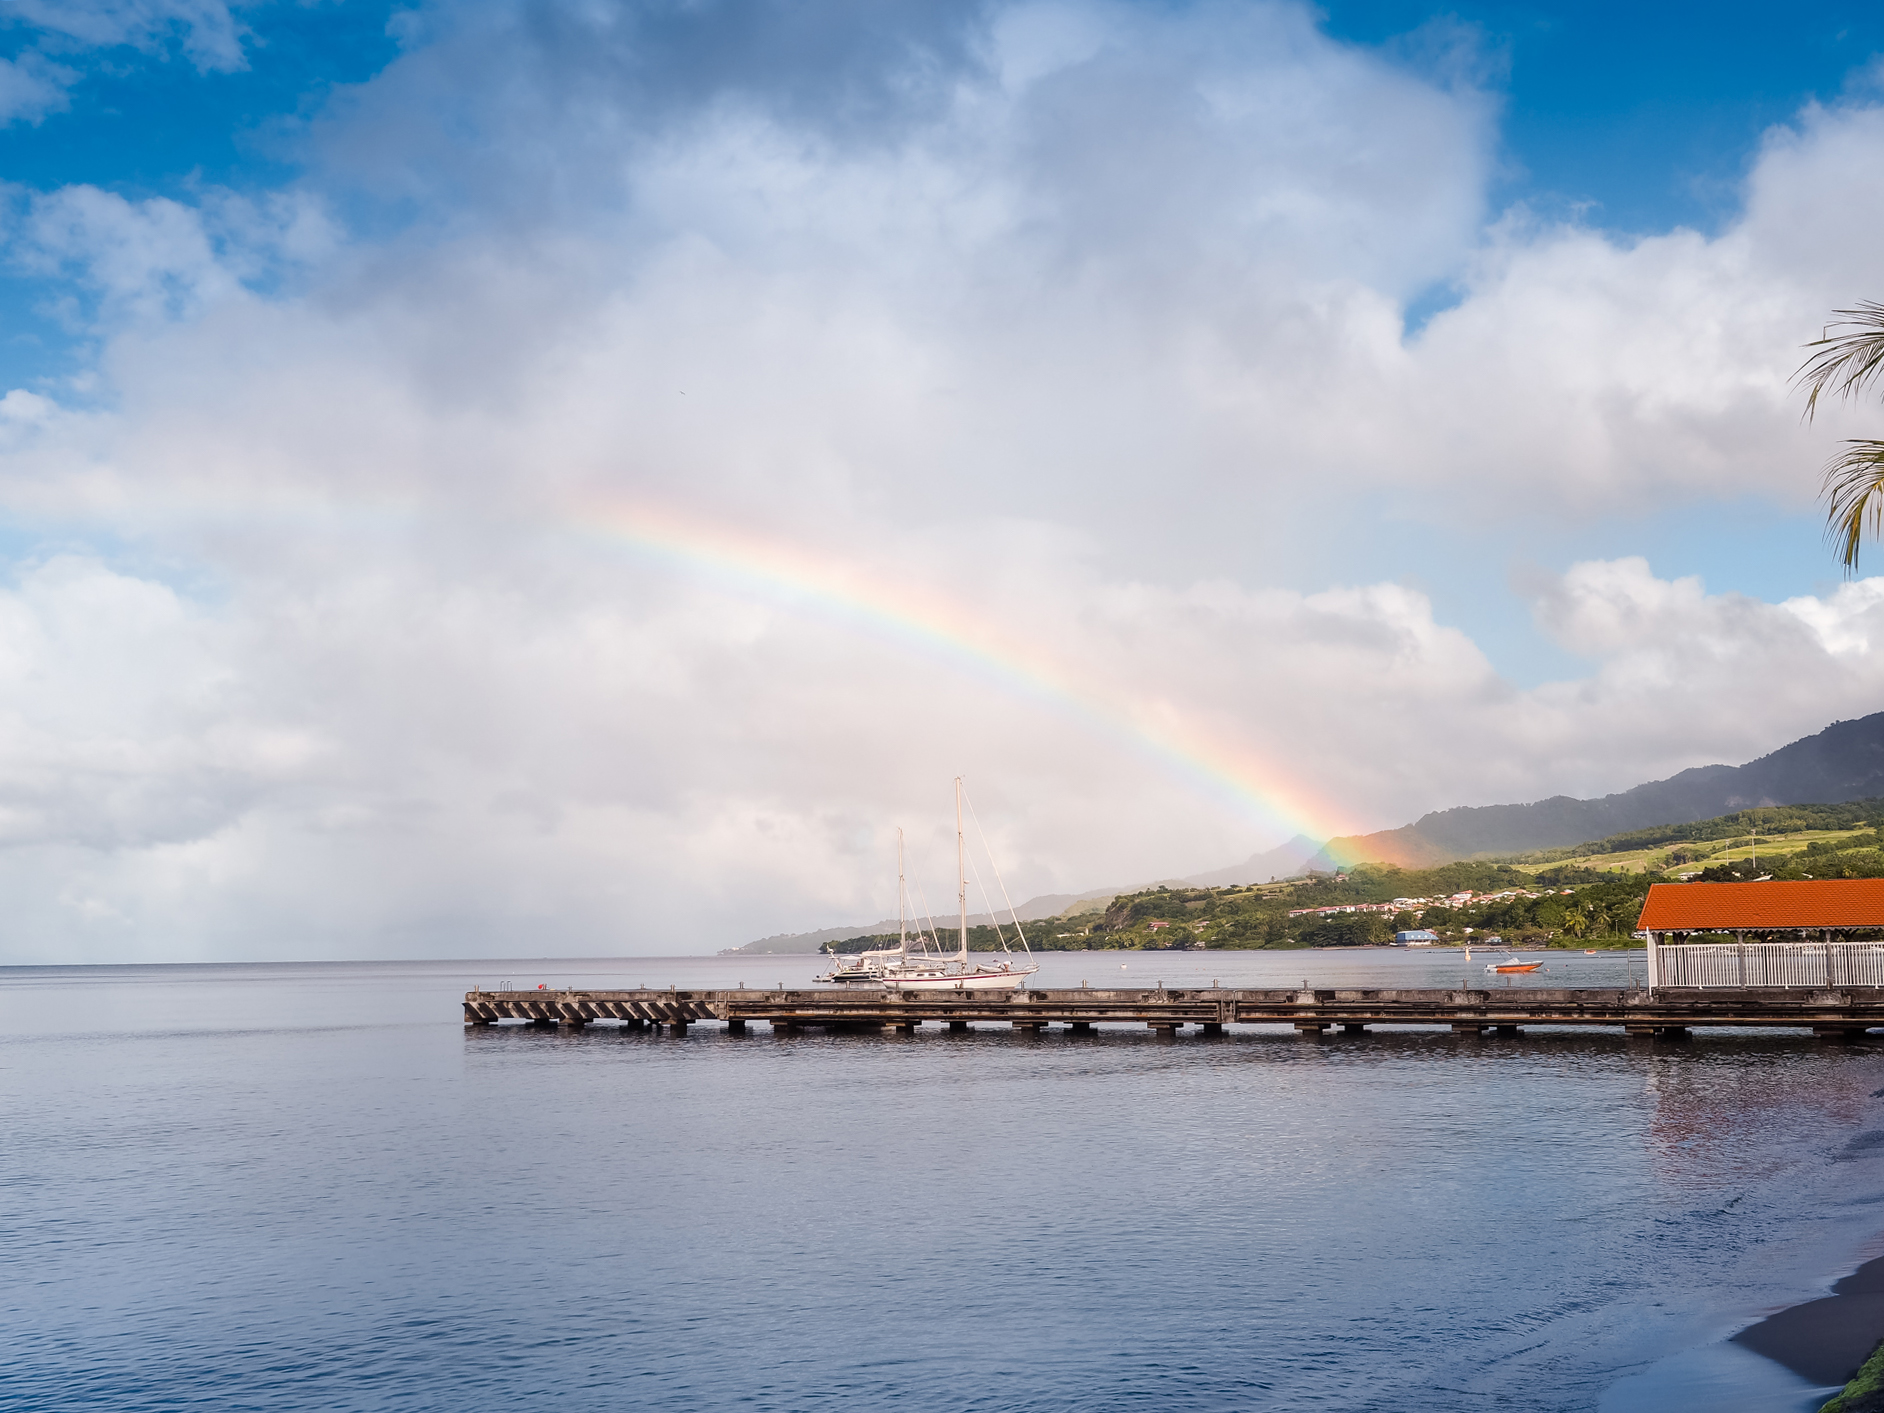 saint-pierre, arc en ciel martinique blog voyage